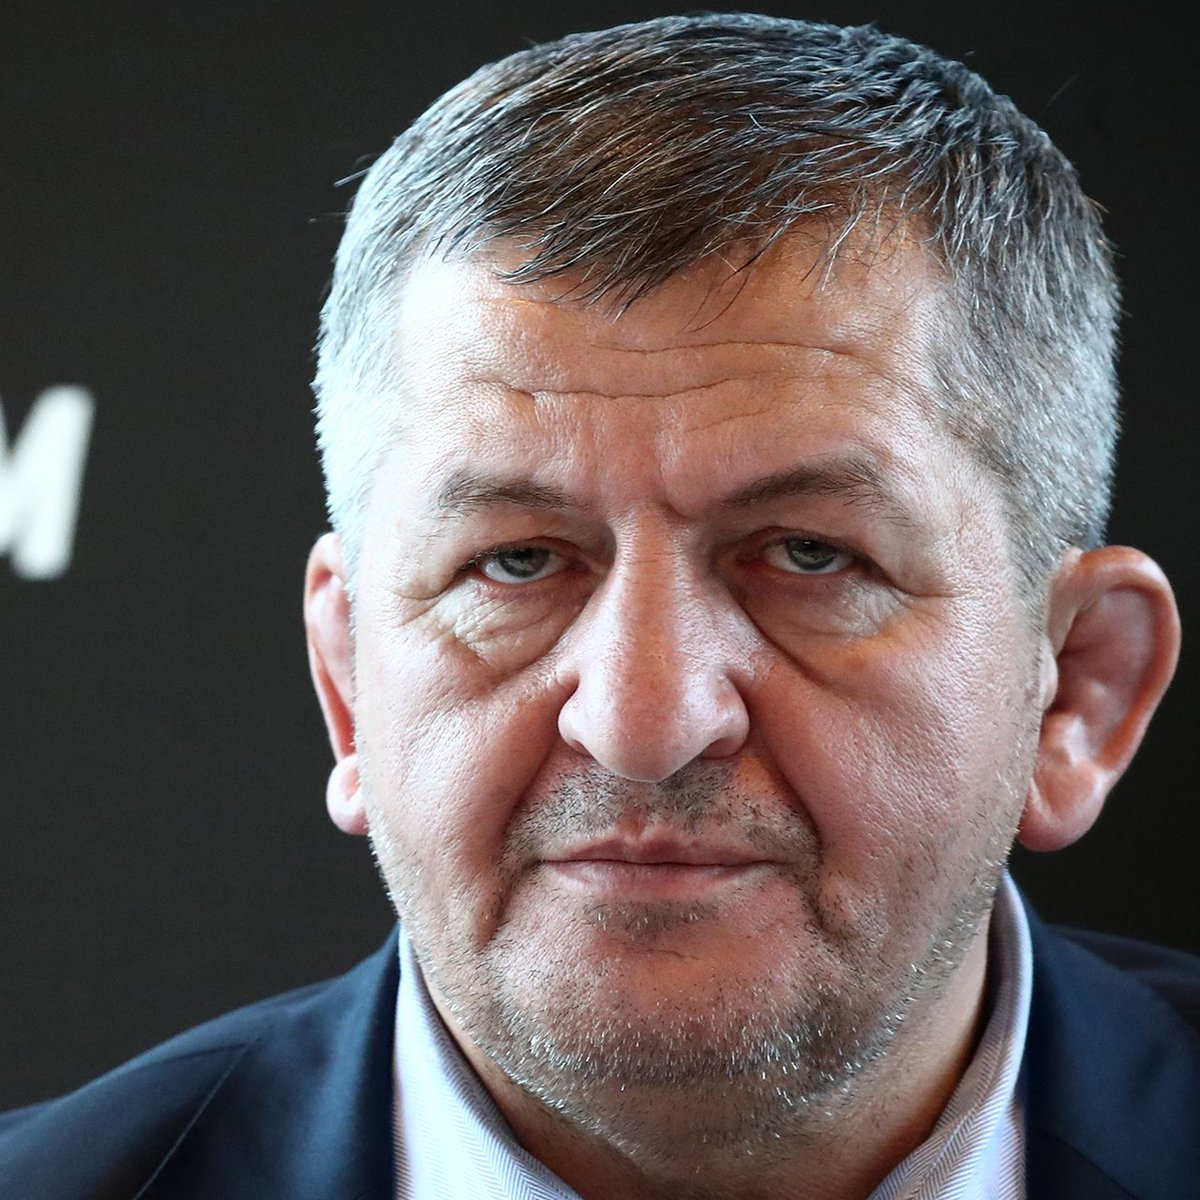 Отец чемпиона UFC Хабиба Нурмагомедова, Абдулманап Нурмагомедов, скончался в Москве - об этом сообщил Рамзан Кадыров.  #ufc249 #хабиб #нурмагомедов https://t.co/BgfjSIZIQB